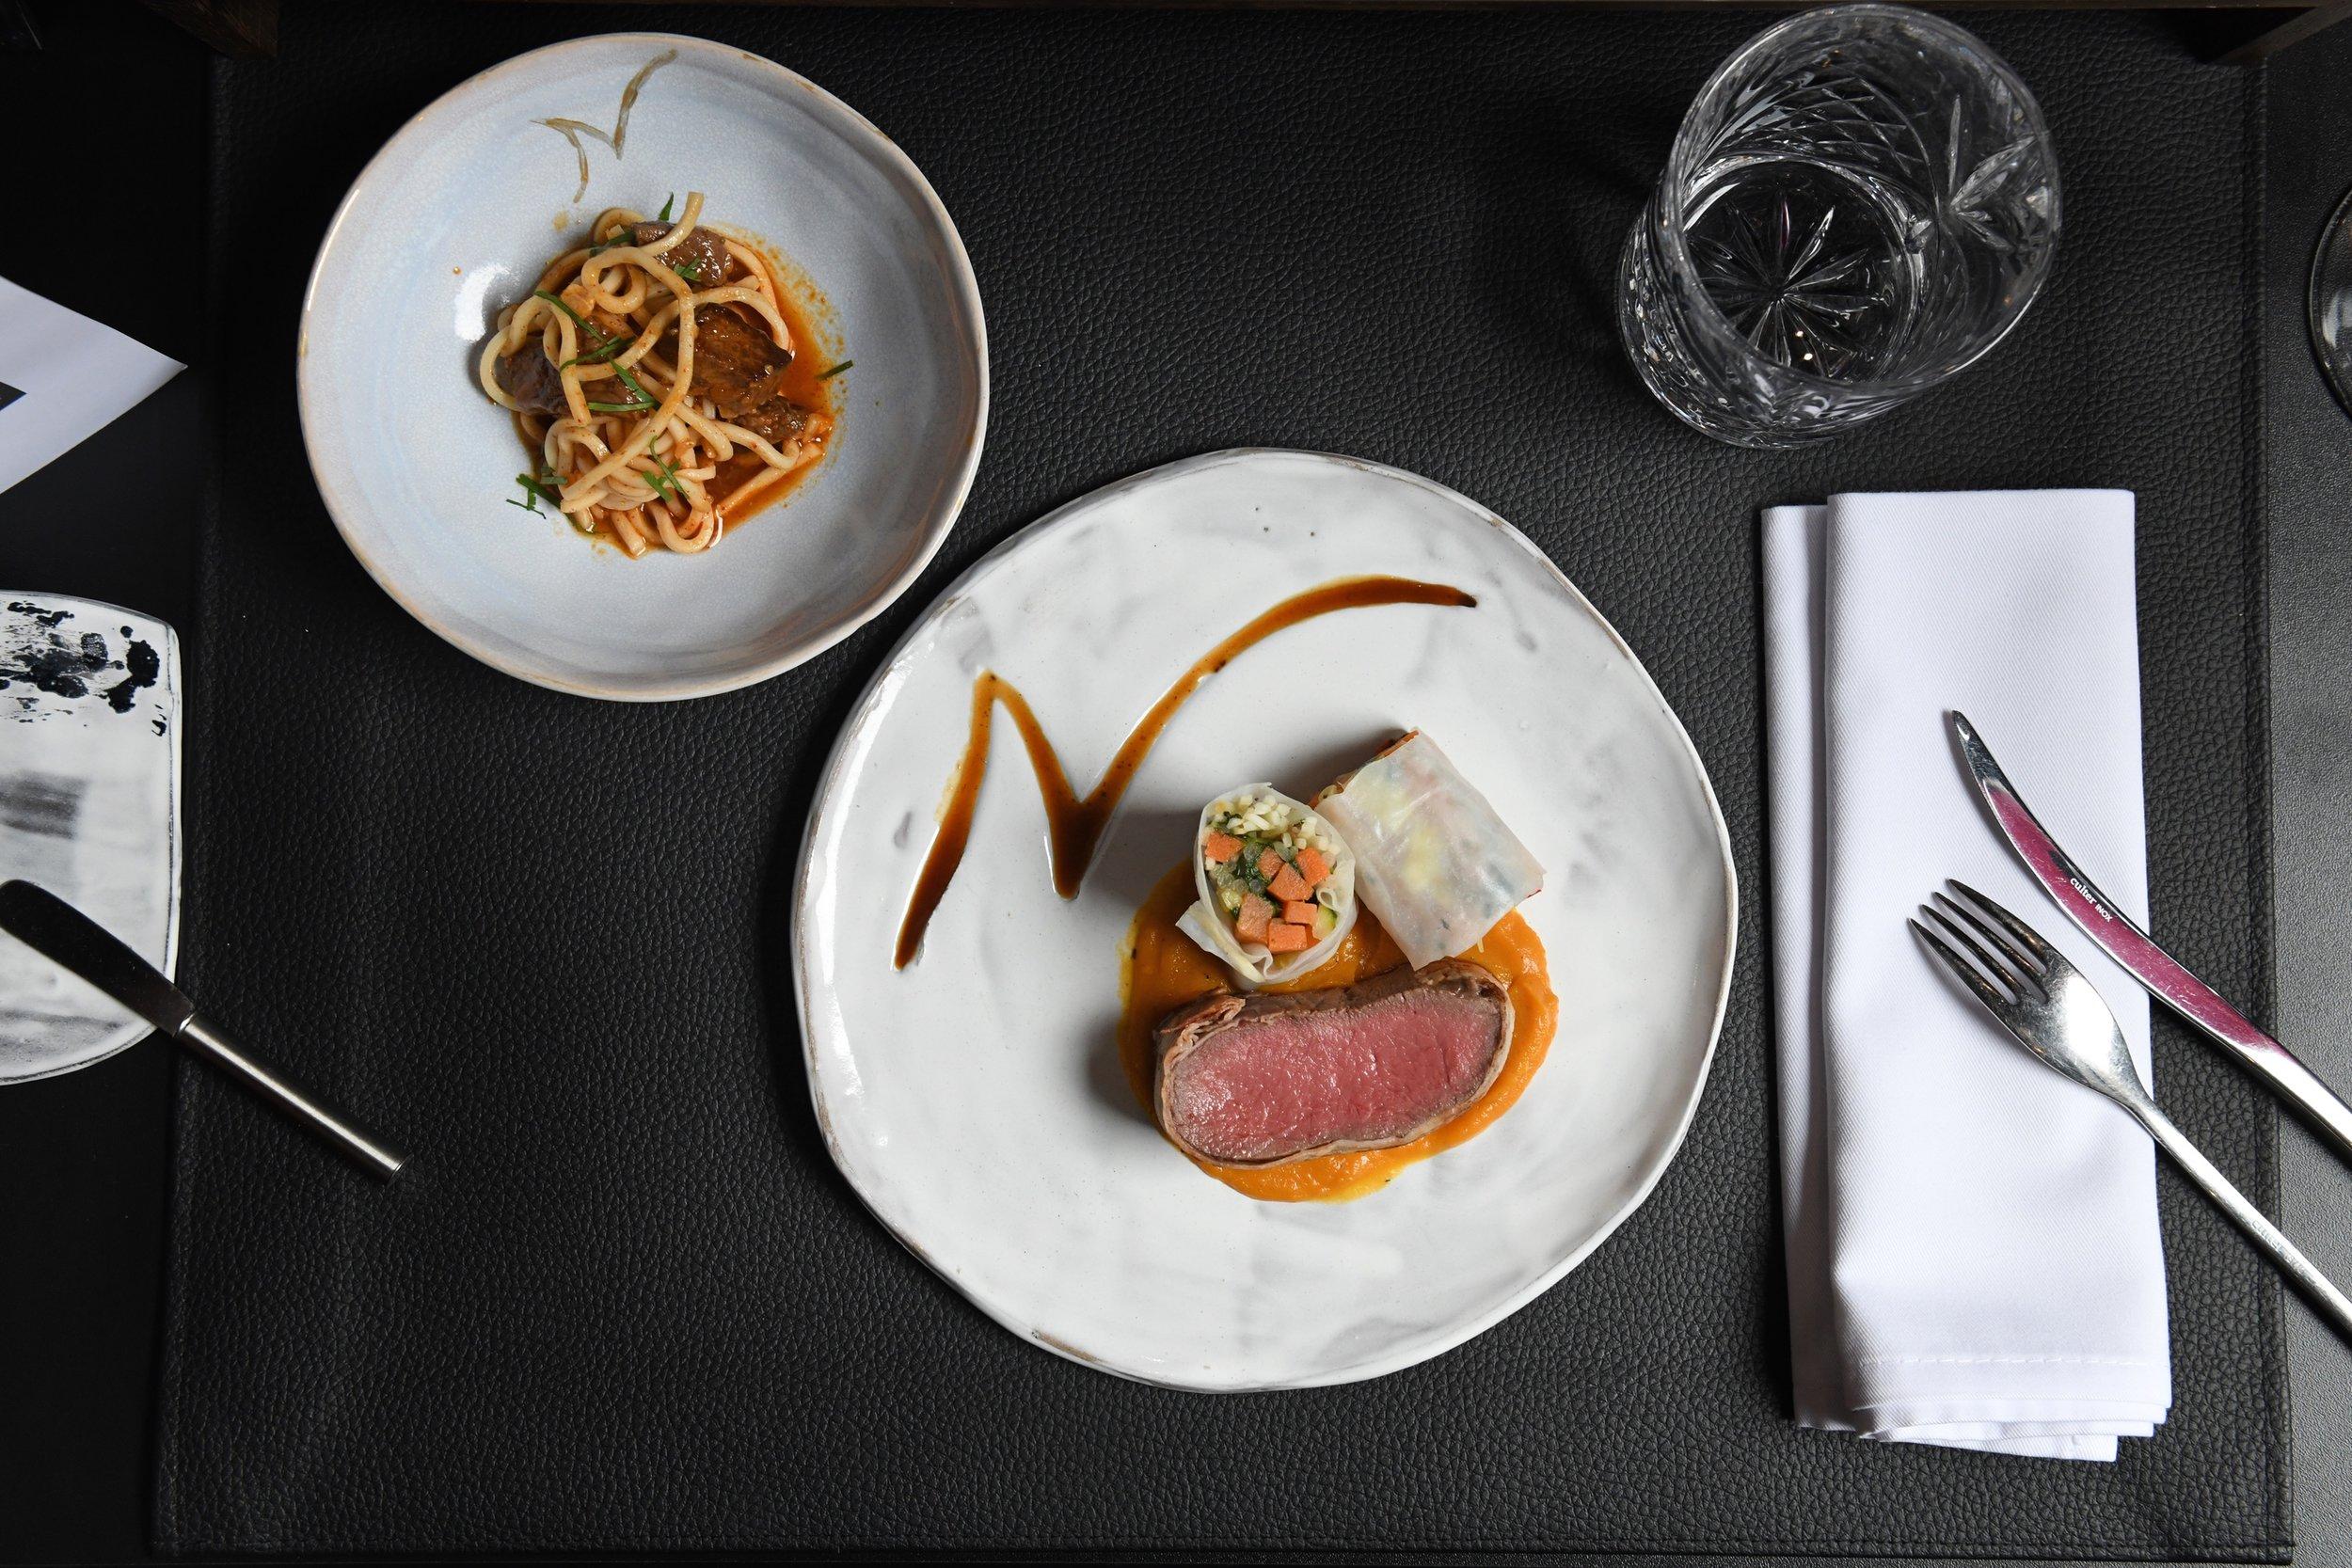 23 restaurant brasserie oud notarishuis ninove bart albrecht tablefever .jpg